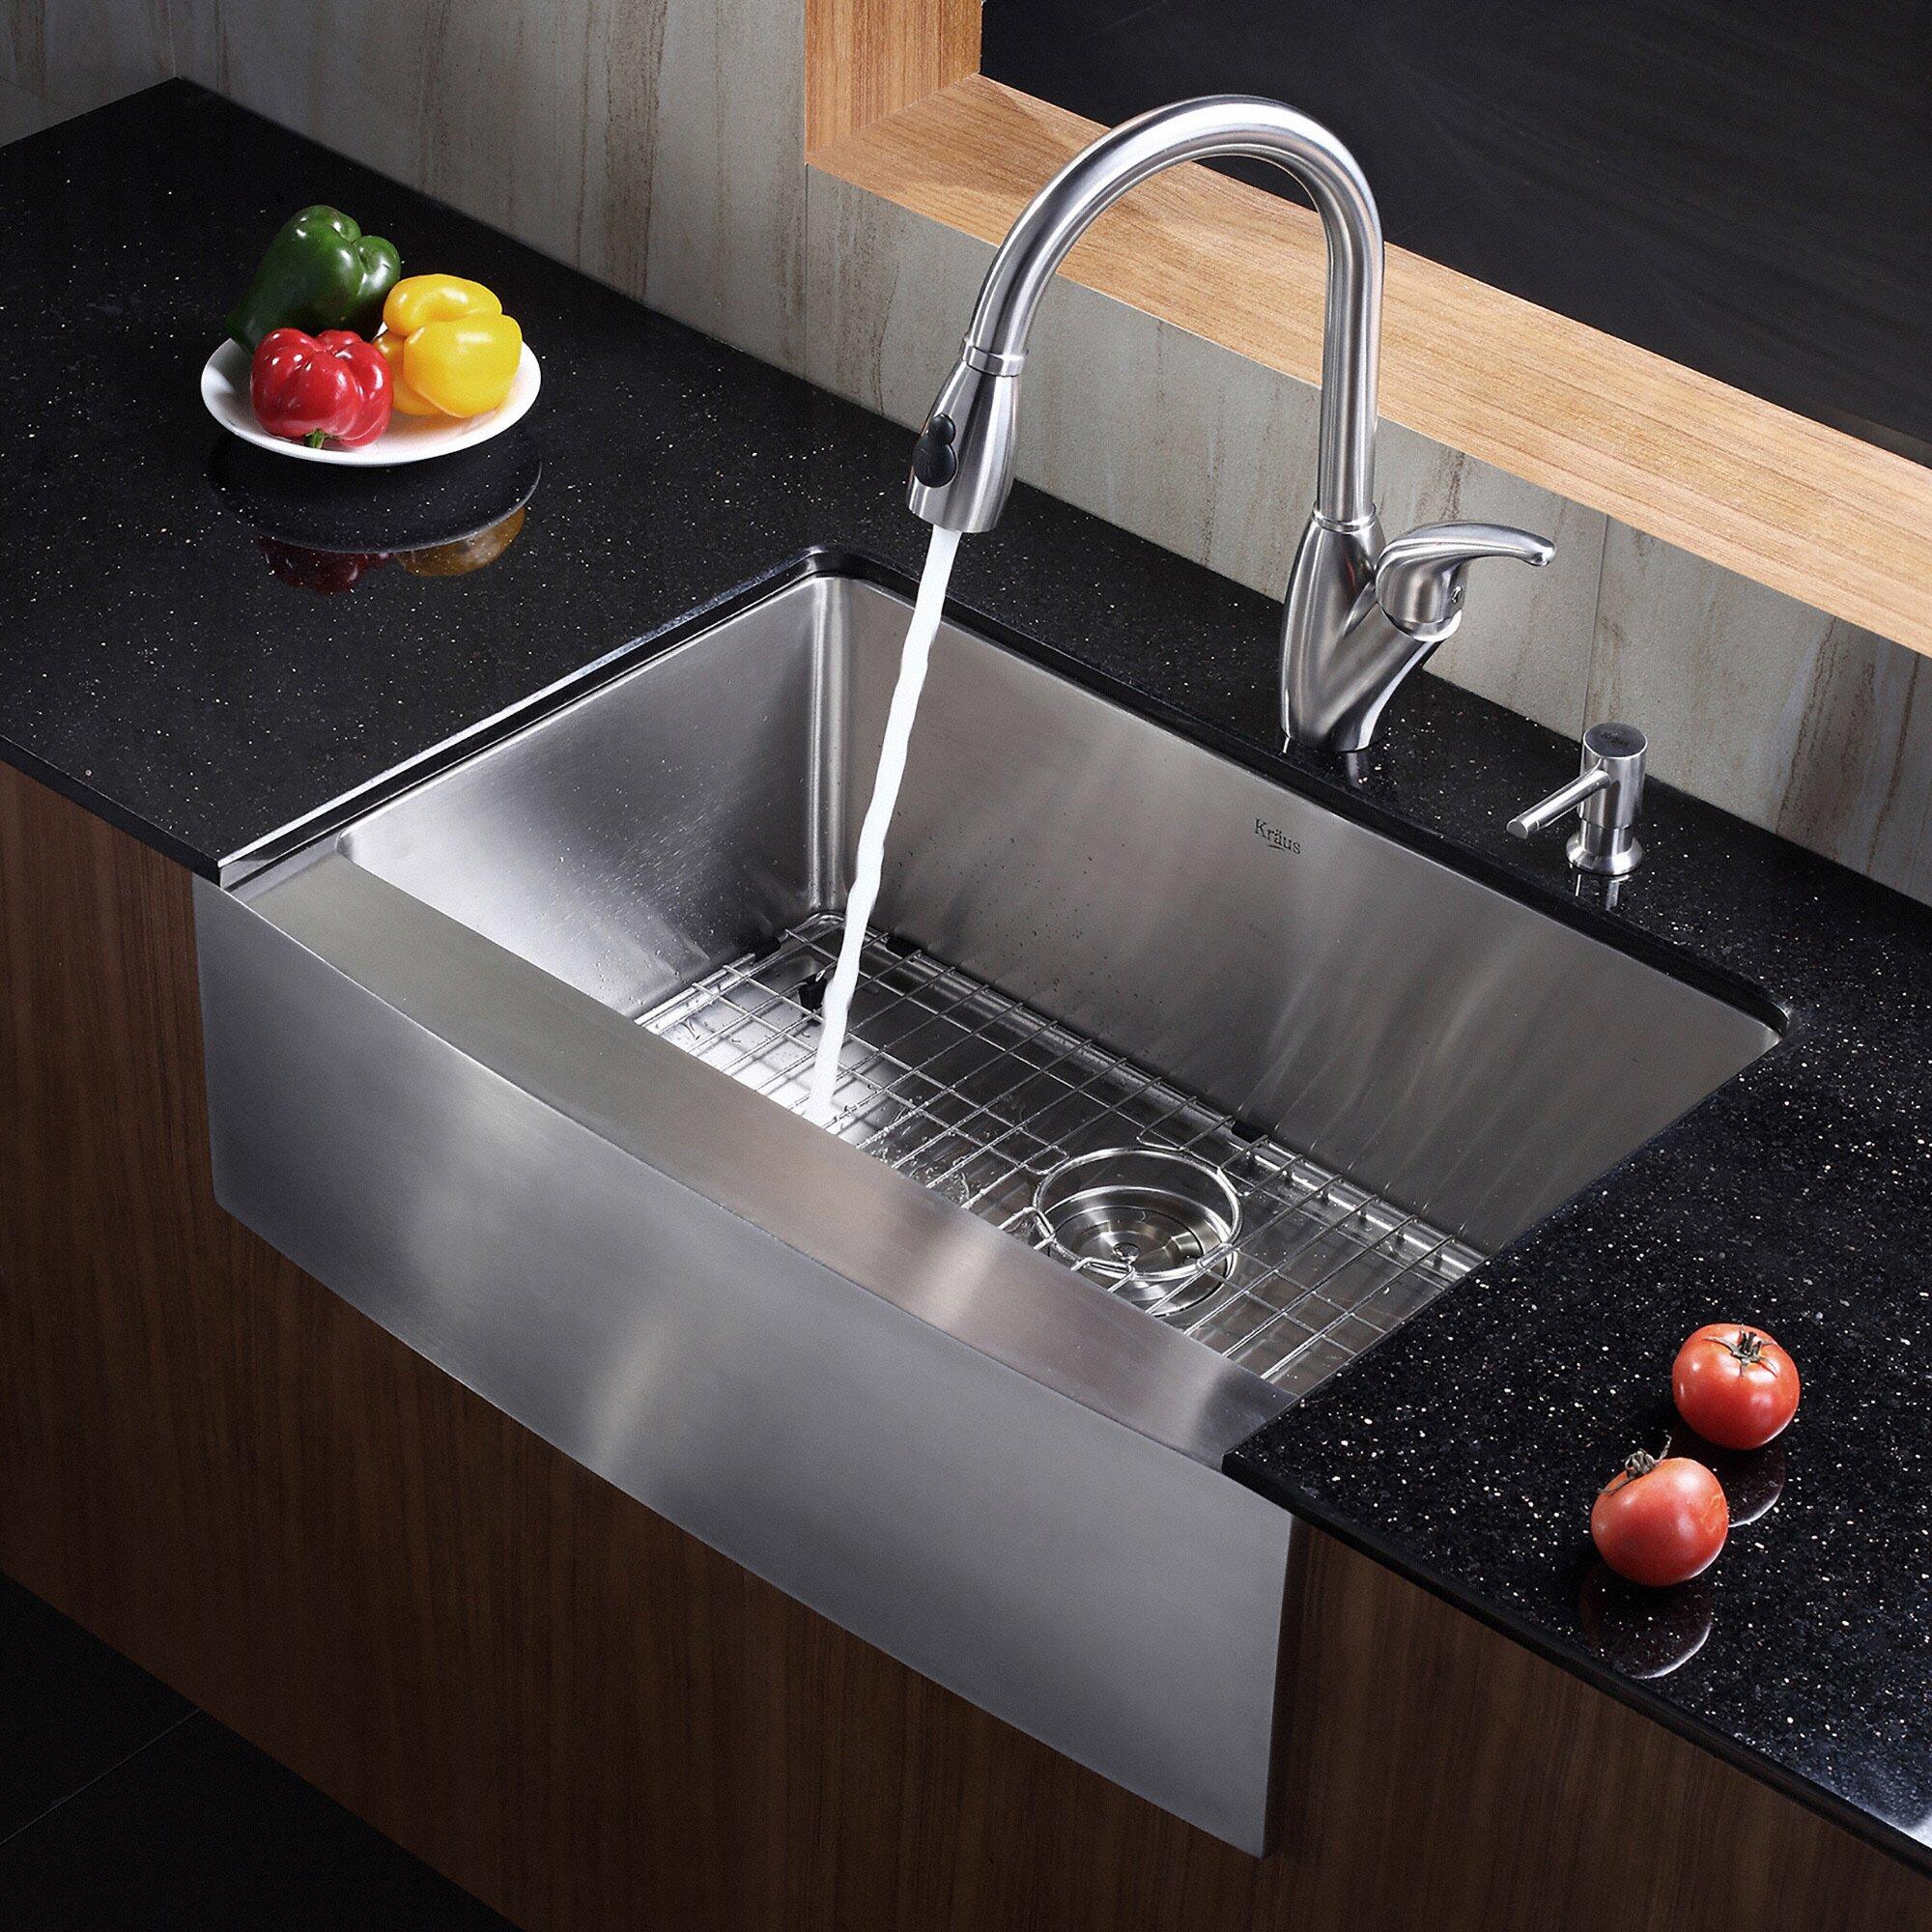 Kraus Kitchen Sink Reviews : Kraus 29